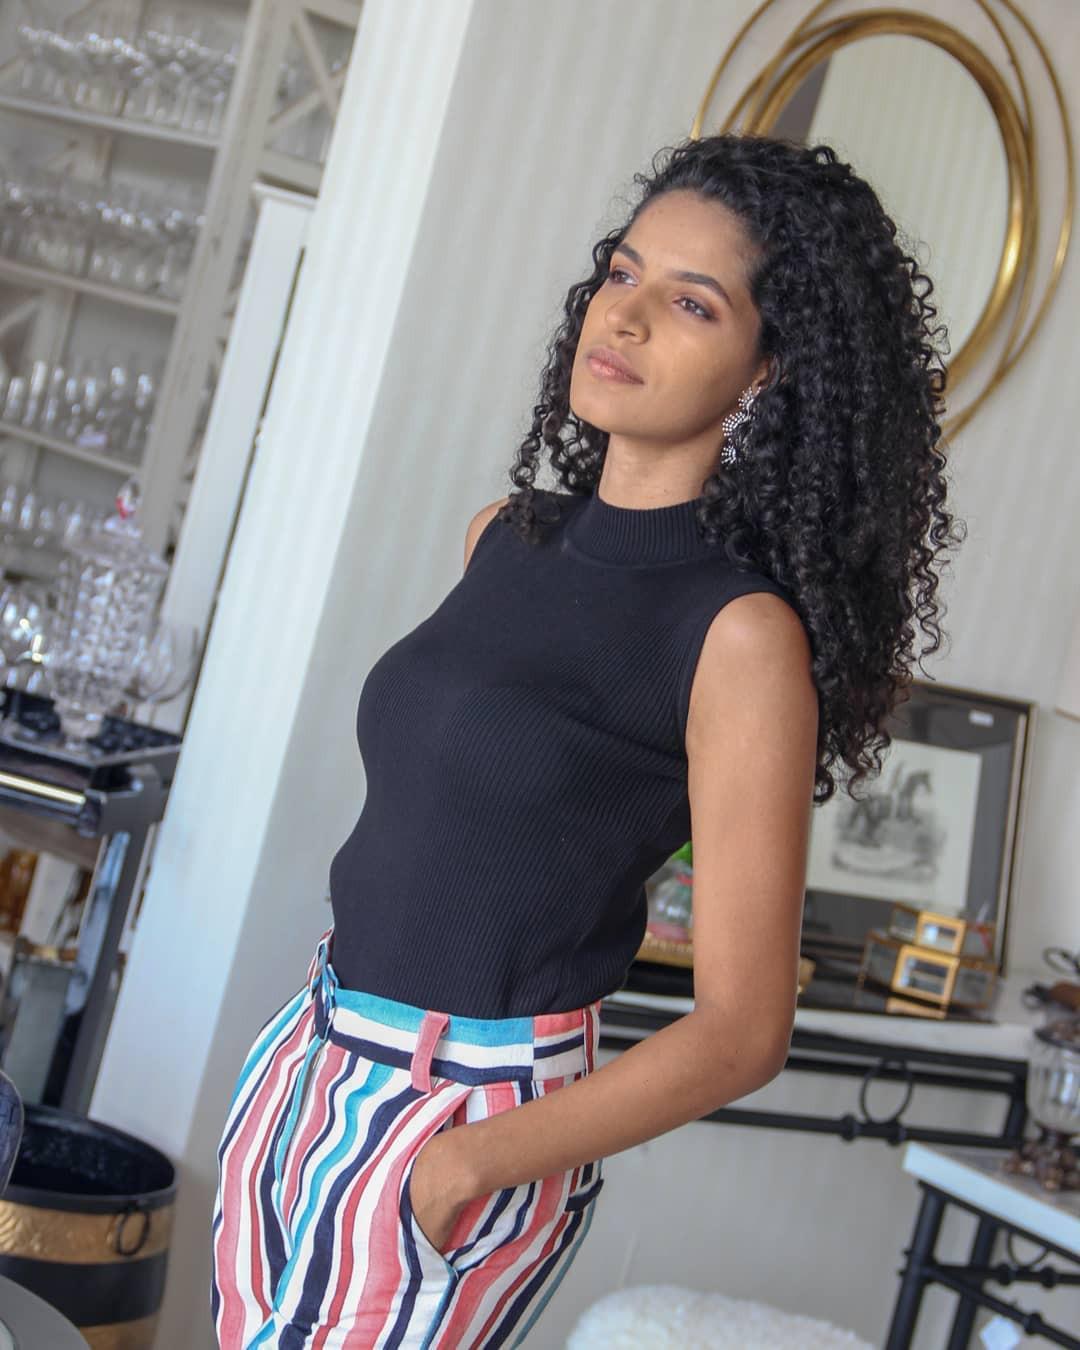 geicyelly mendes, top 20 de miss brasil mundo 2019. - Página 3 Fy08cu10